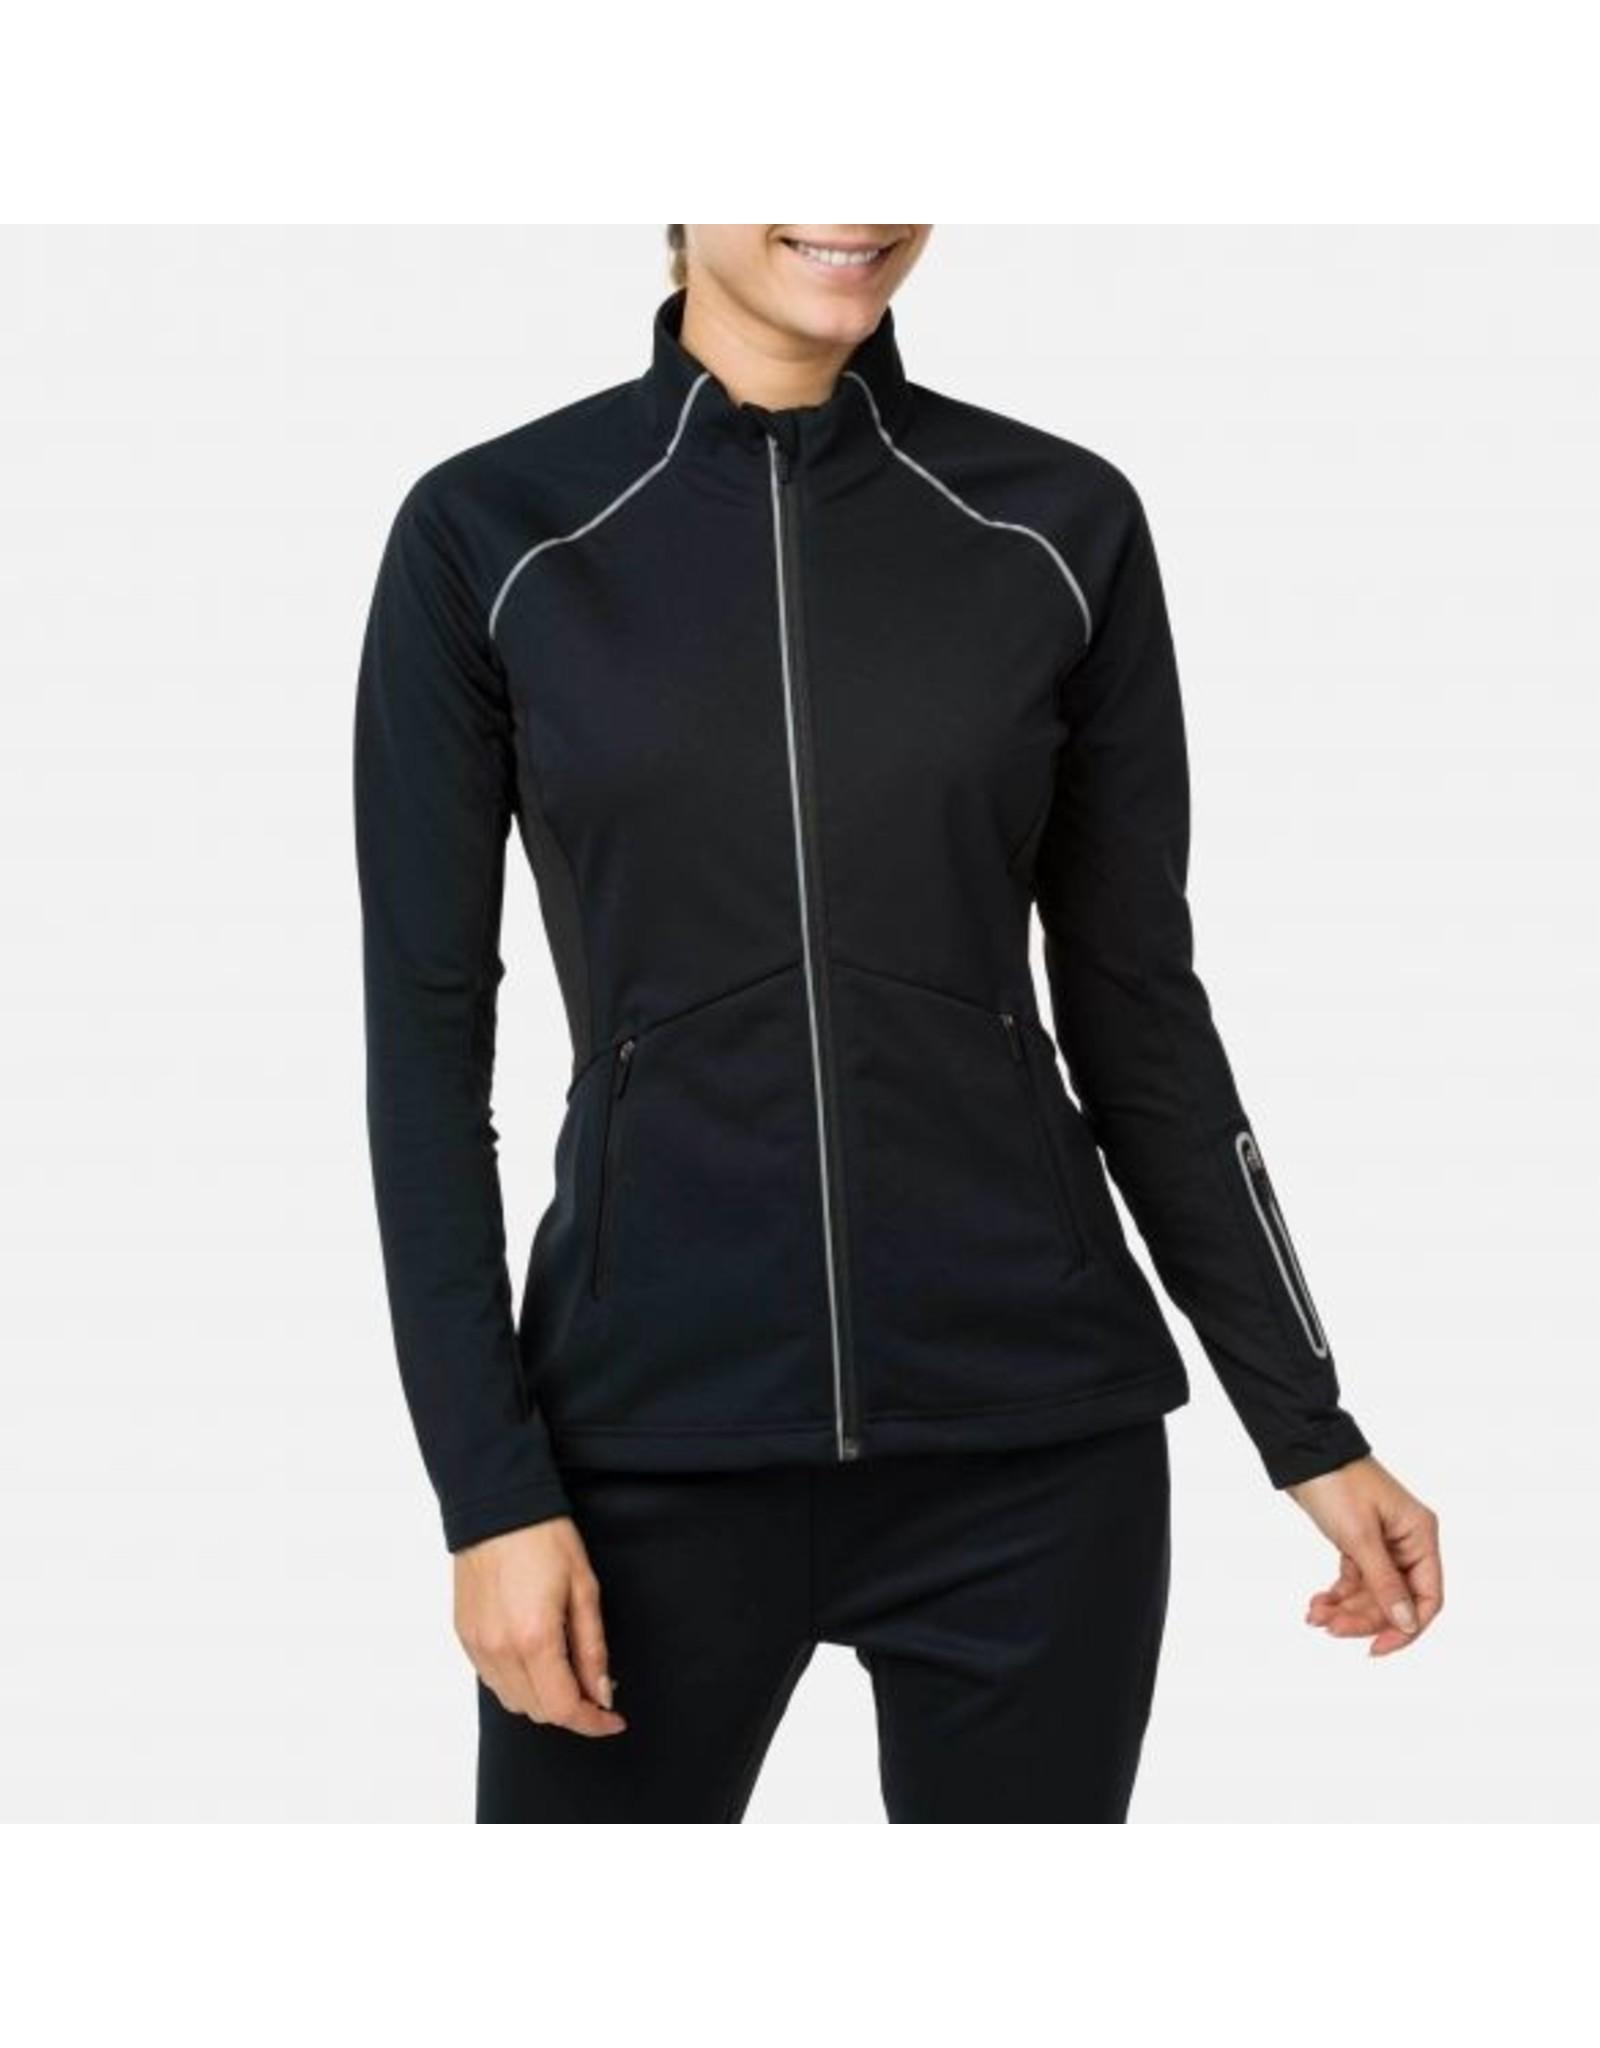 Rossignol Women's Softshell Jacket